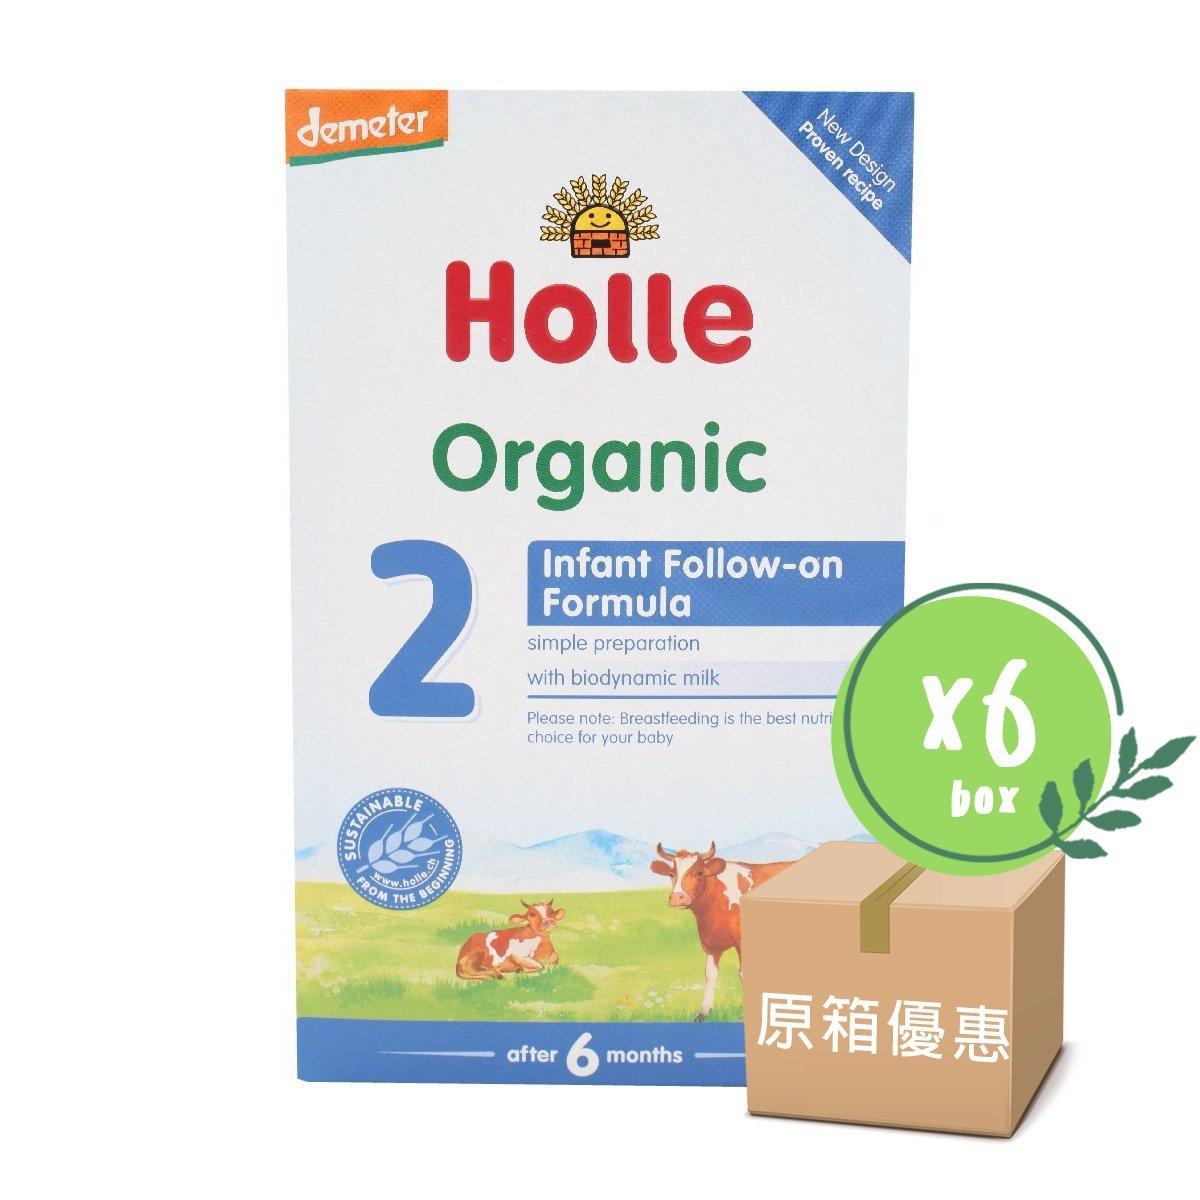 C2 Organic Follow-on Formula 2 (6-12 months) x 6 boxes (no hormone, no anti-biotic)